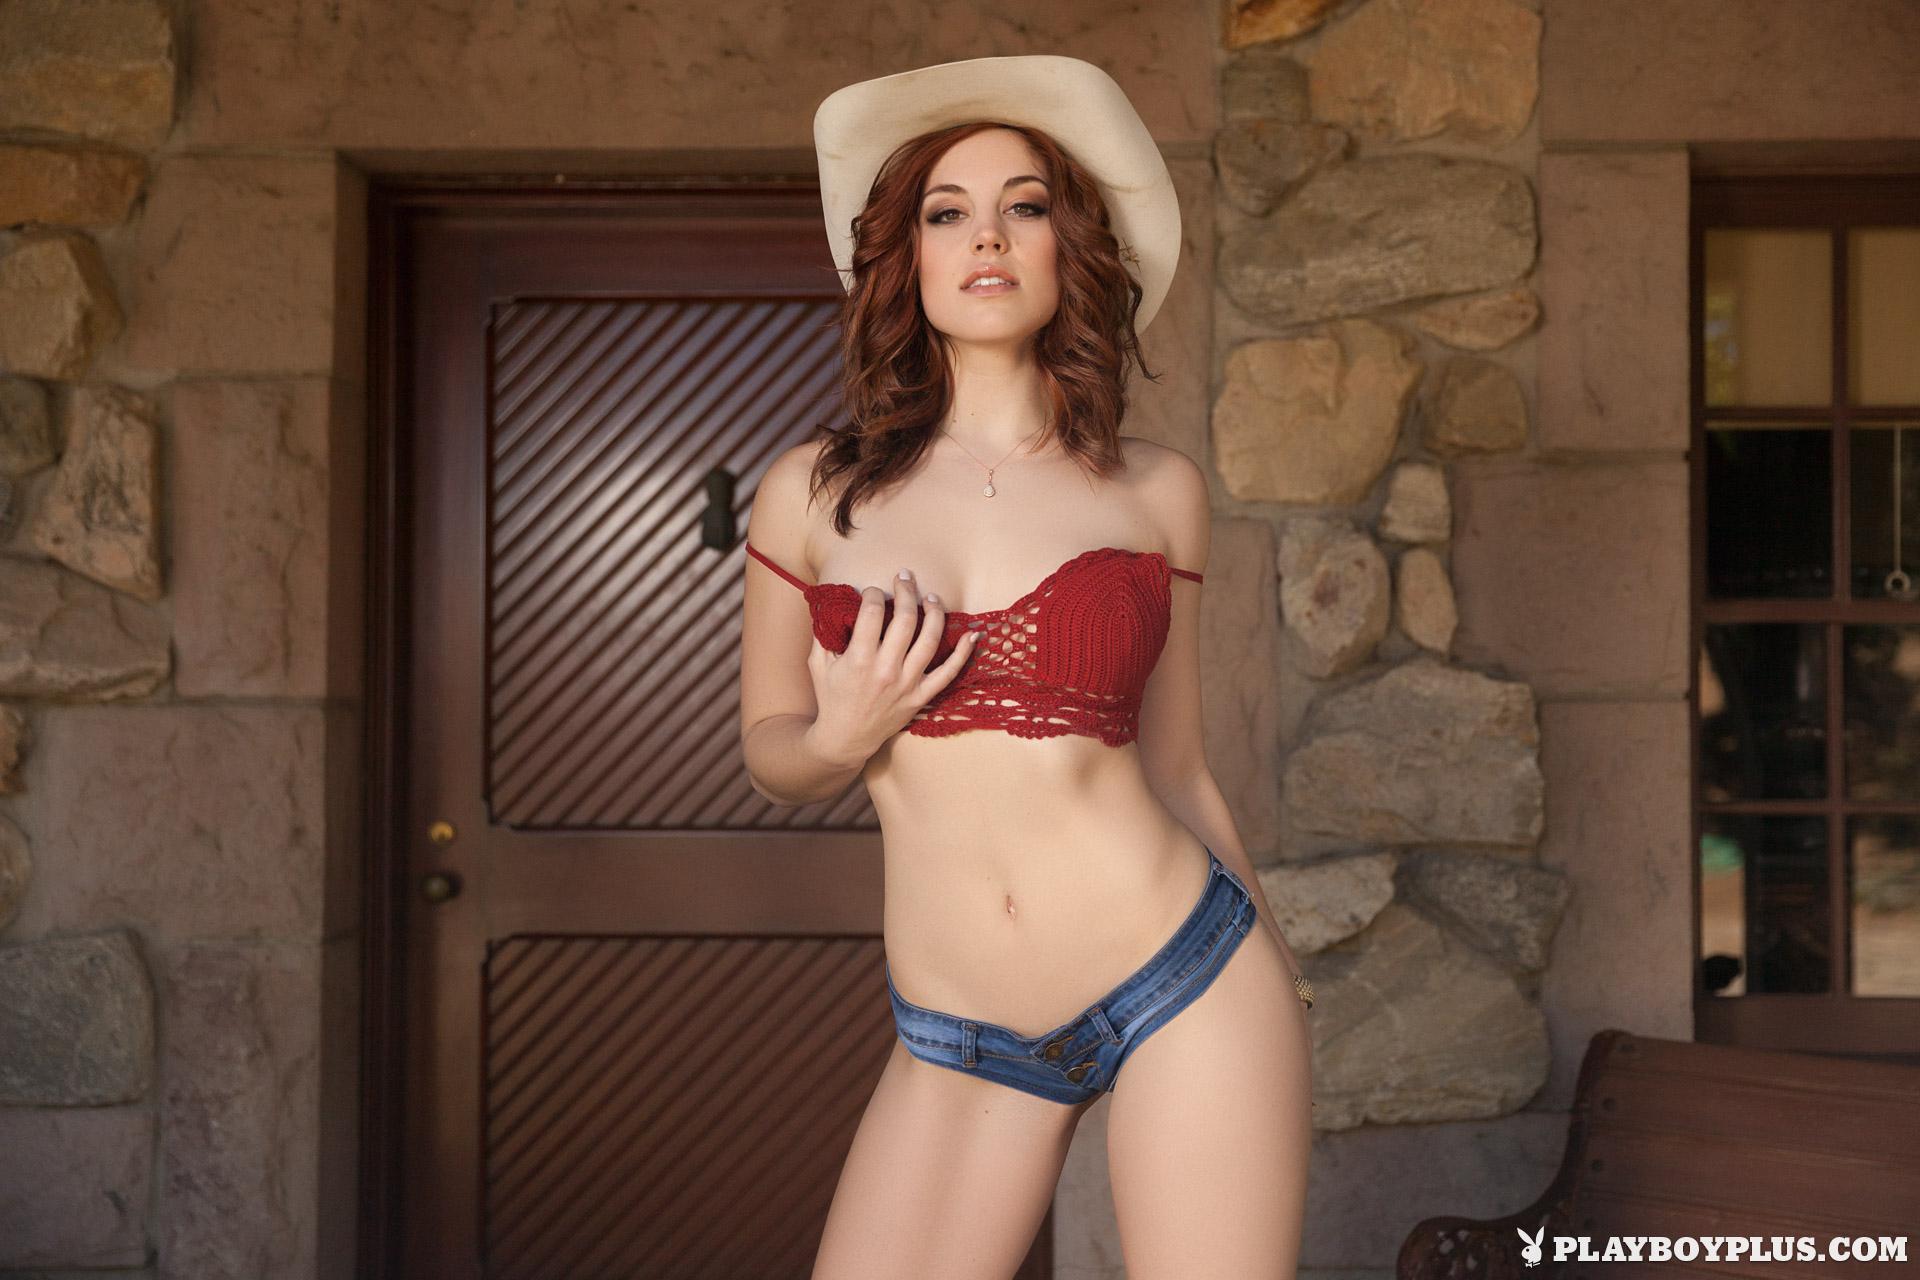 Redhead booty pics